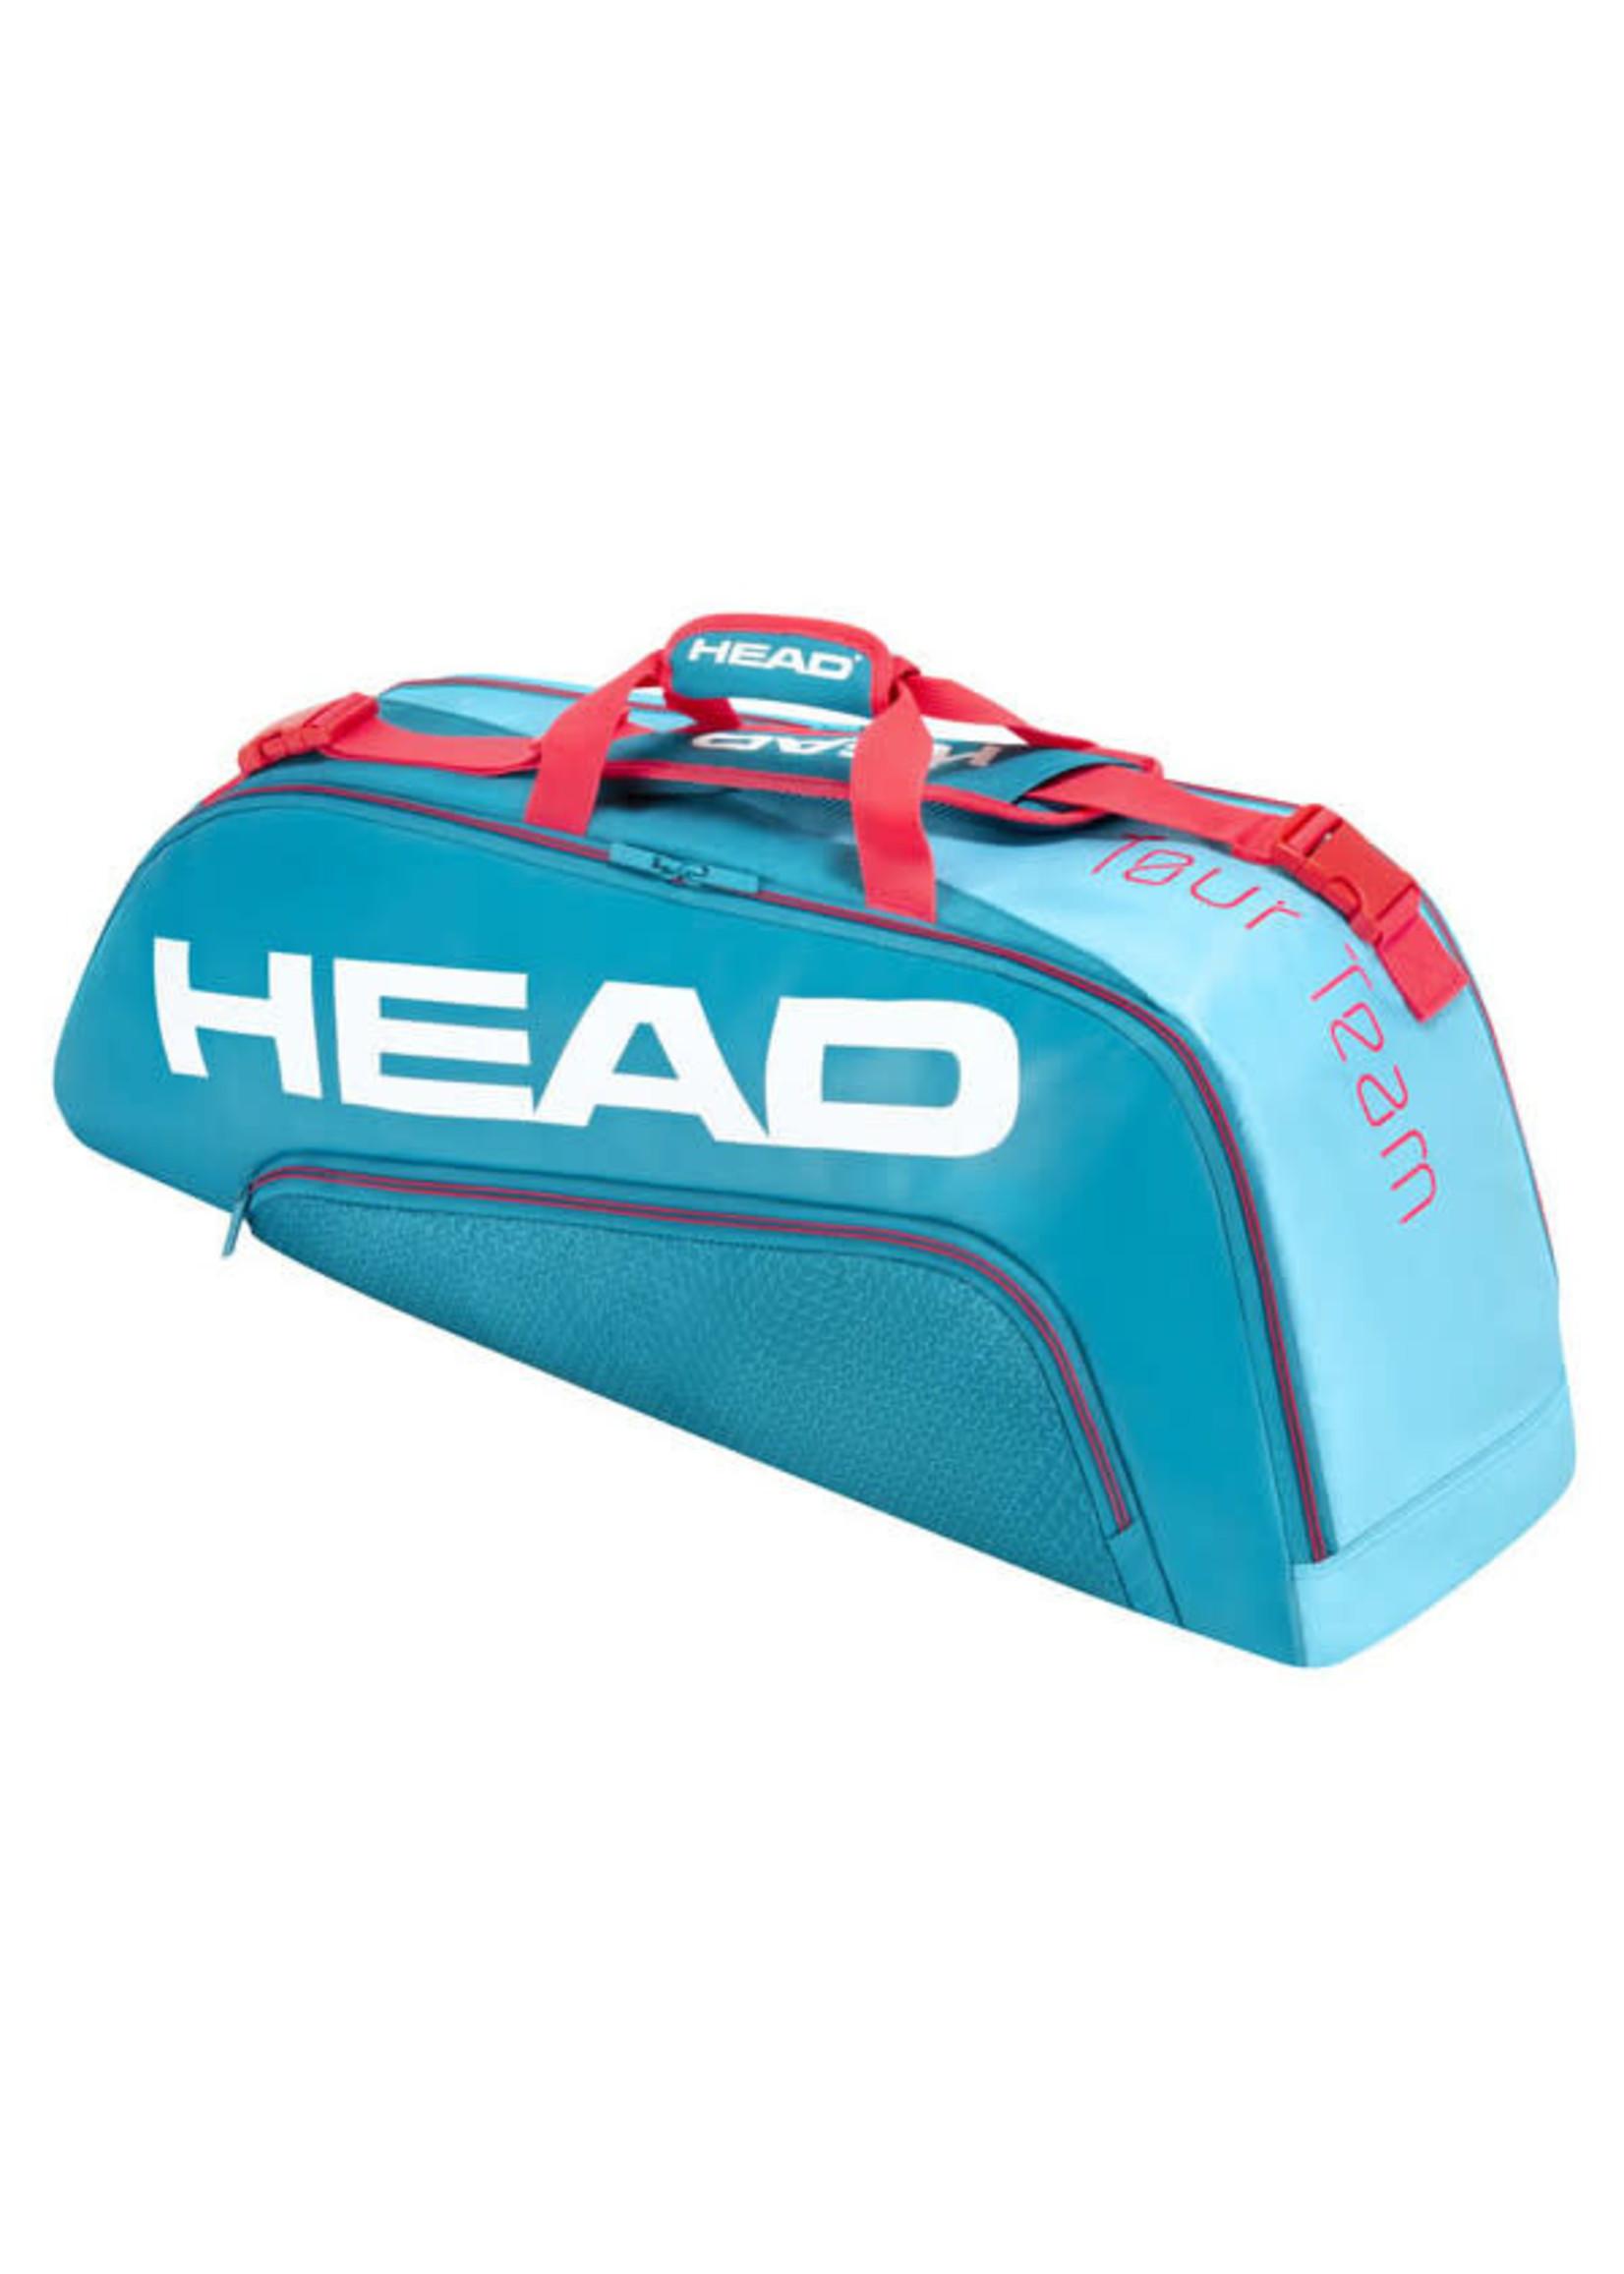 Head Head Tour Team 6R Combi Racket Bag (2021)